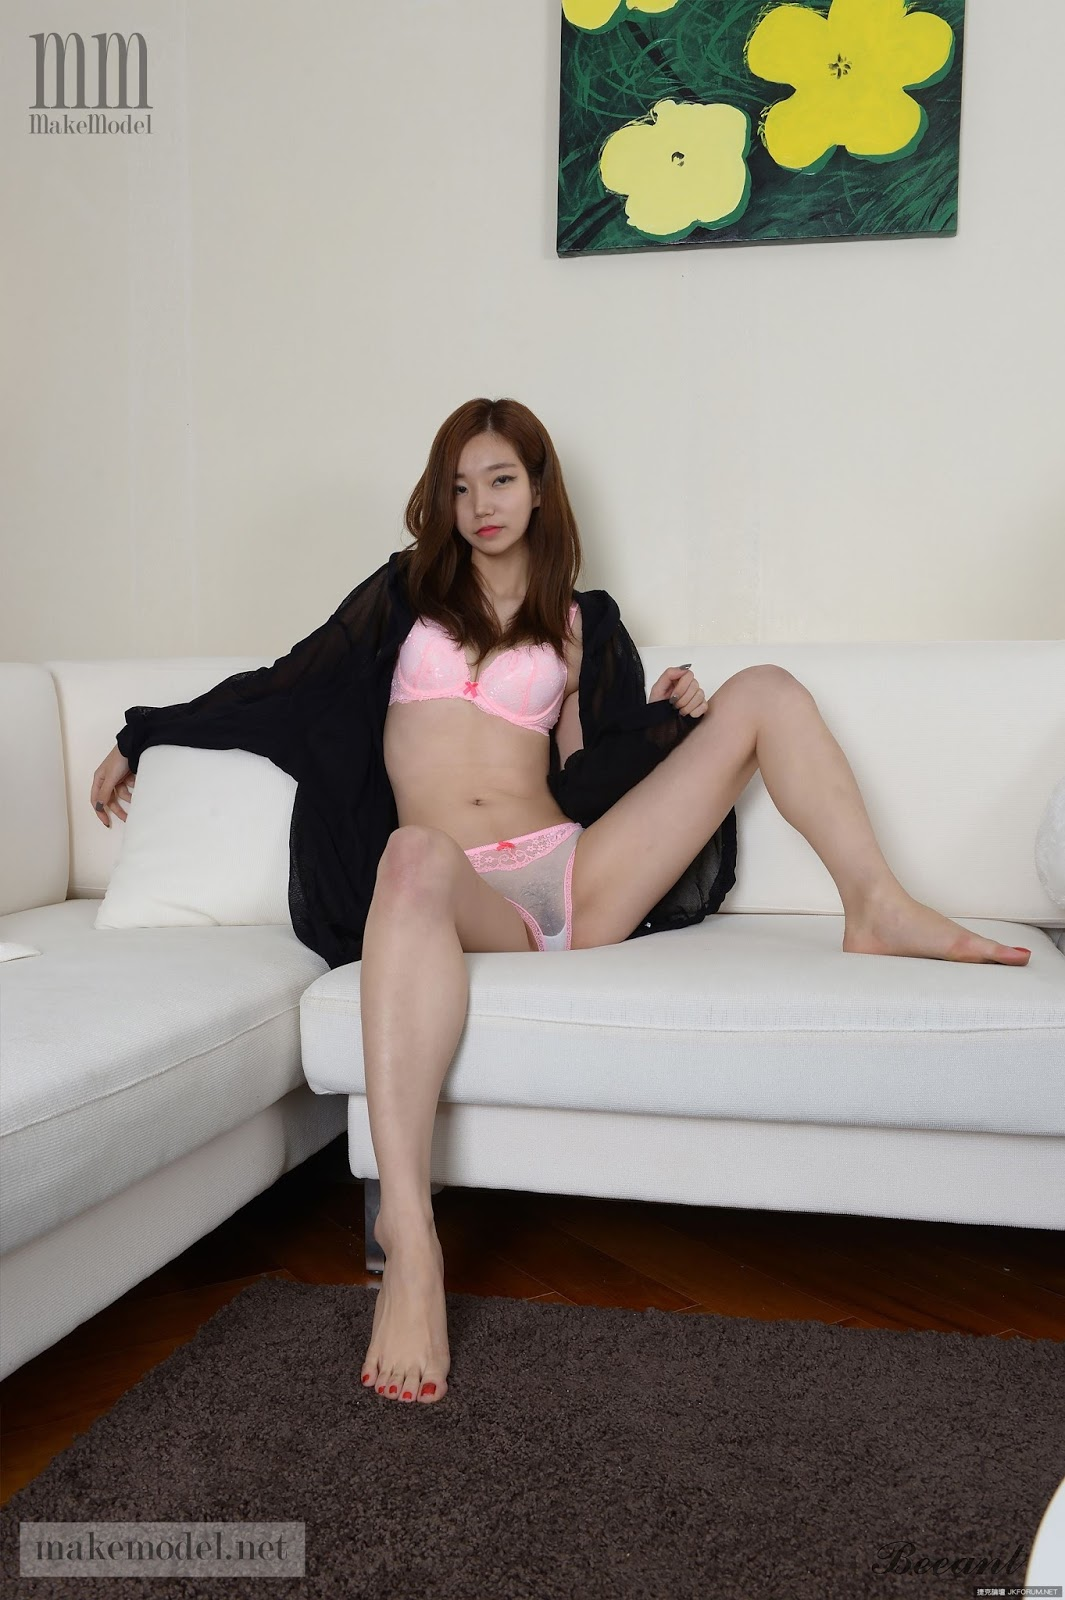 Dayeong%2BPretty%2B%25E9%259F%2593%25E5%259C%258B%2BKorean%2BTeen%2BNaked%2B%2526%2BUncensored 270912 16 - Korean Nude - Big Albom Remain #A-korean girl